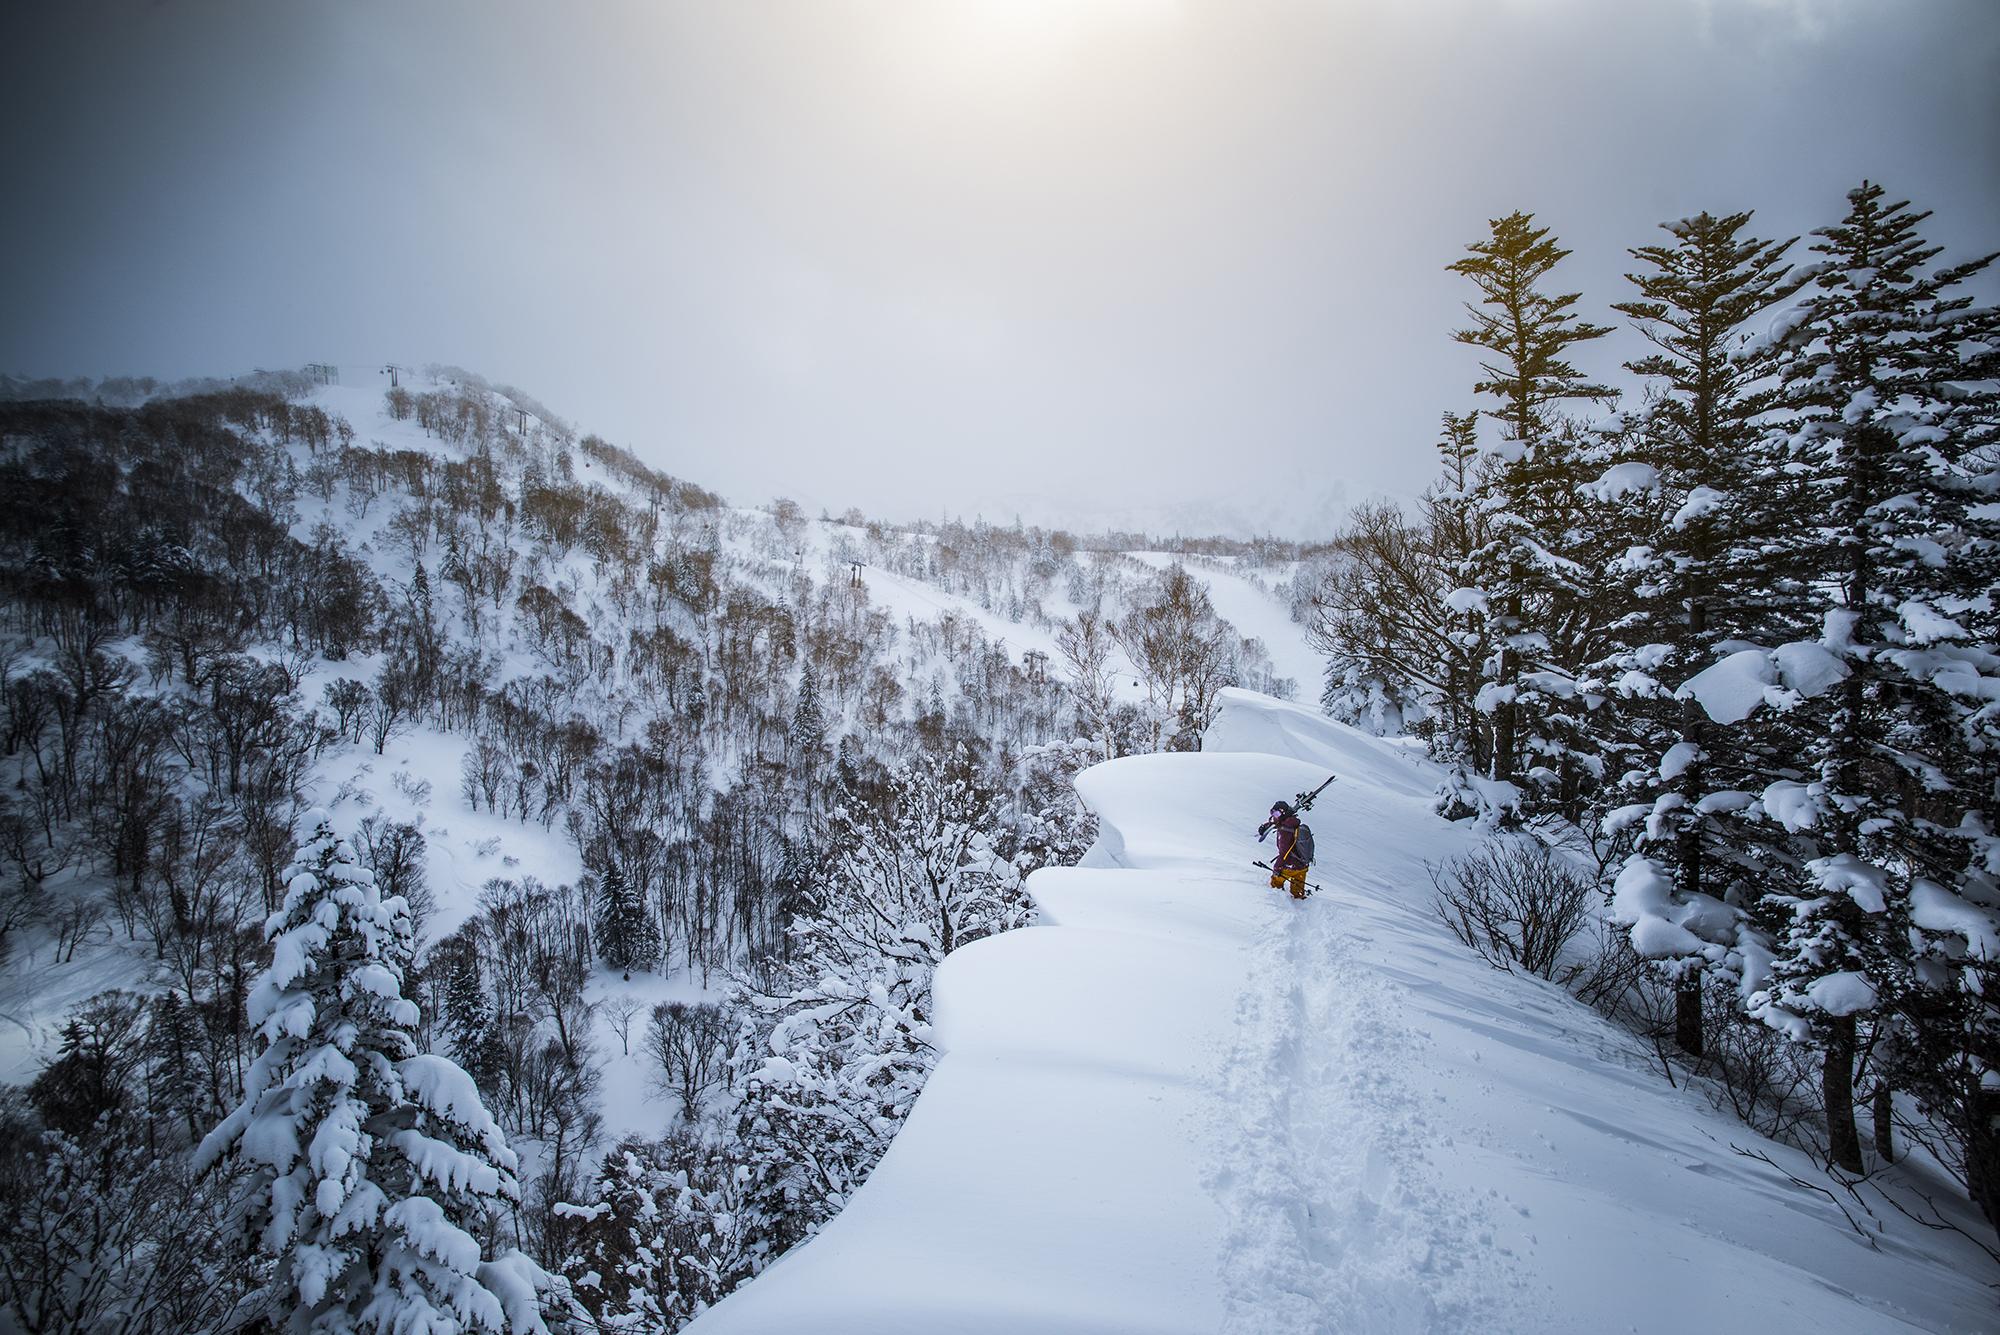 Tatum Monod. Mt Eboshi, Hokkaido Japan. Photography by Tim Kemple.